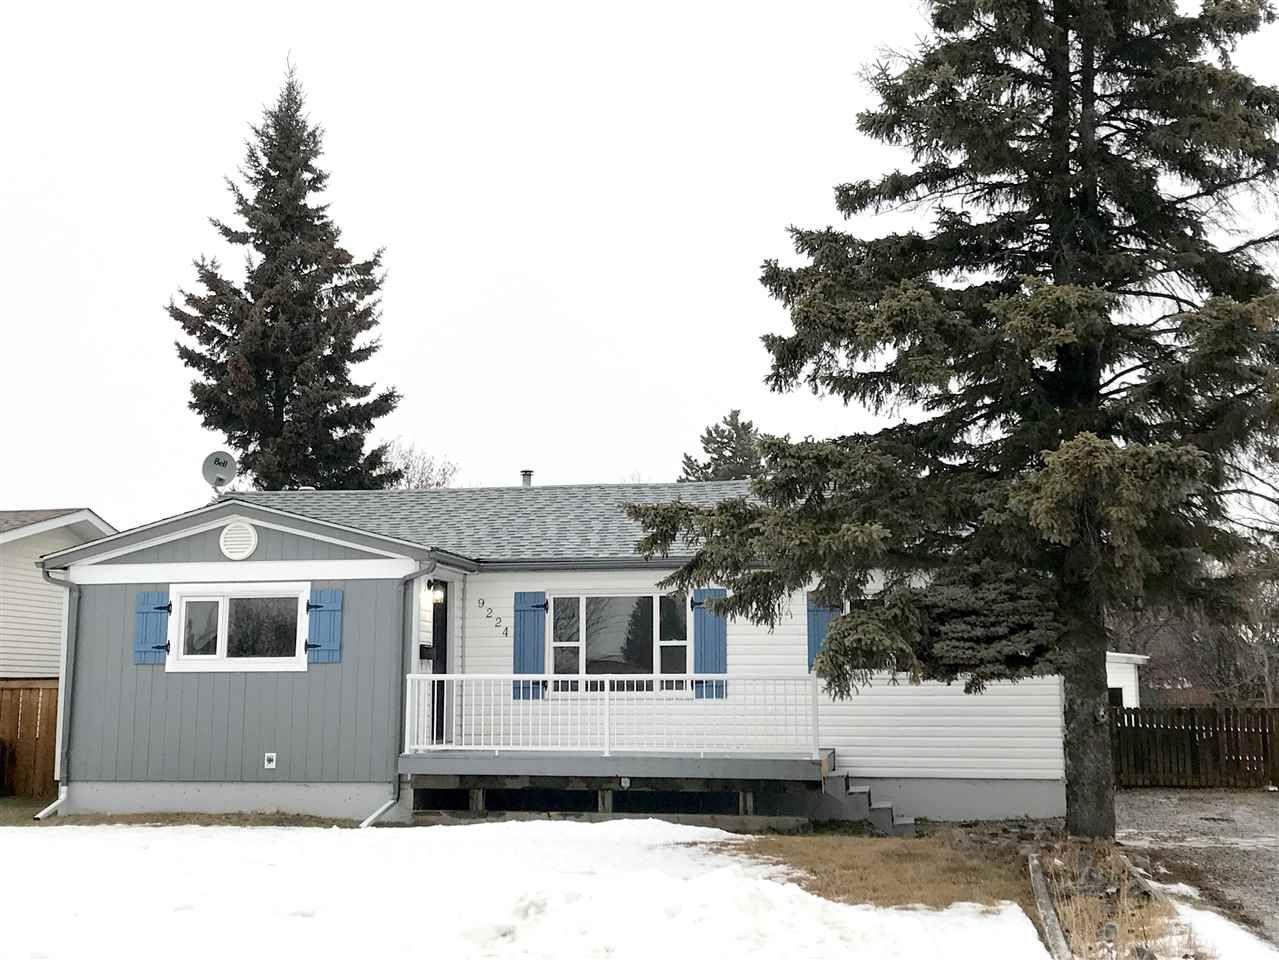 Main Photo: 9224 107 AVENUE in : Fort St. John - City NE House for sale : MLS®# R2310251